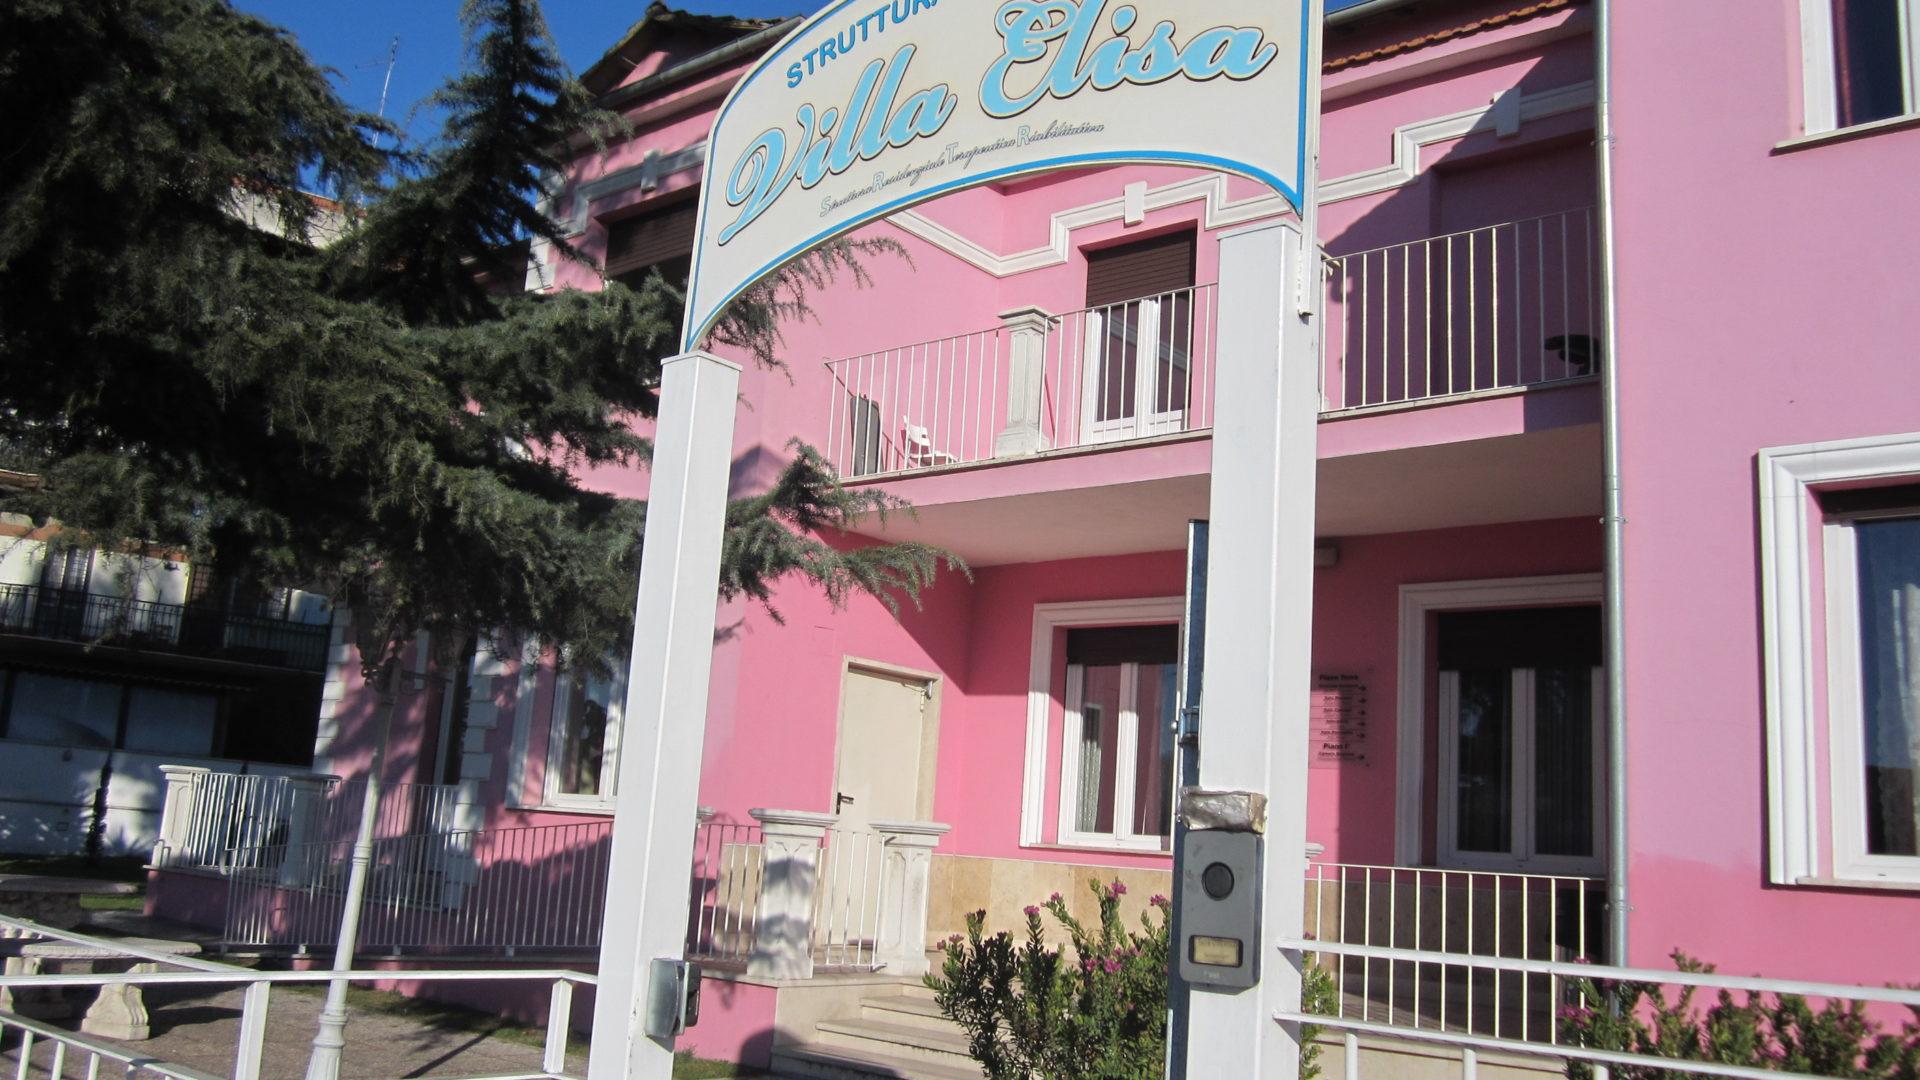 Villa Elisa Srtr